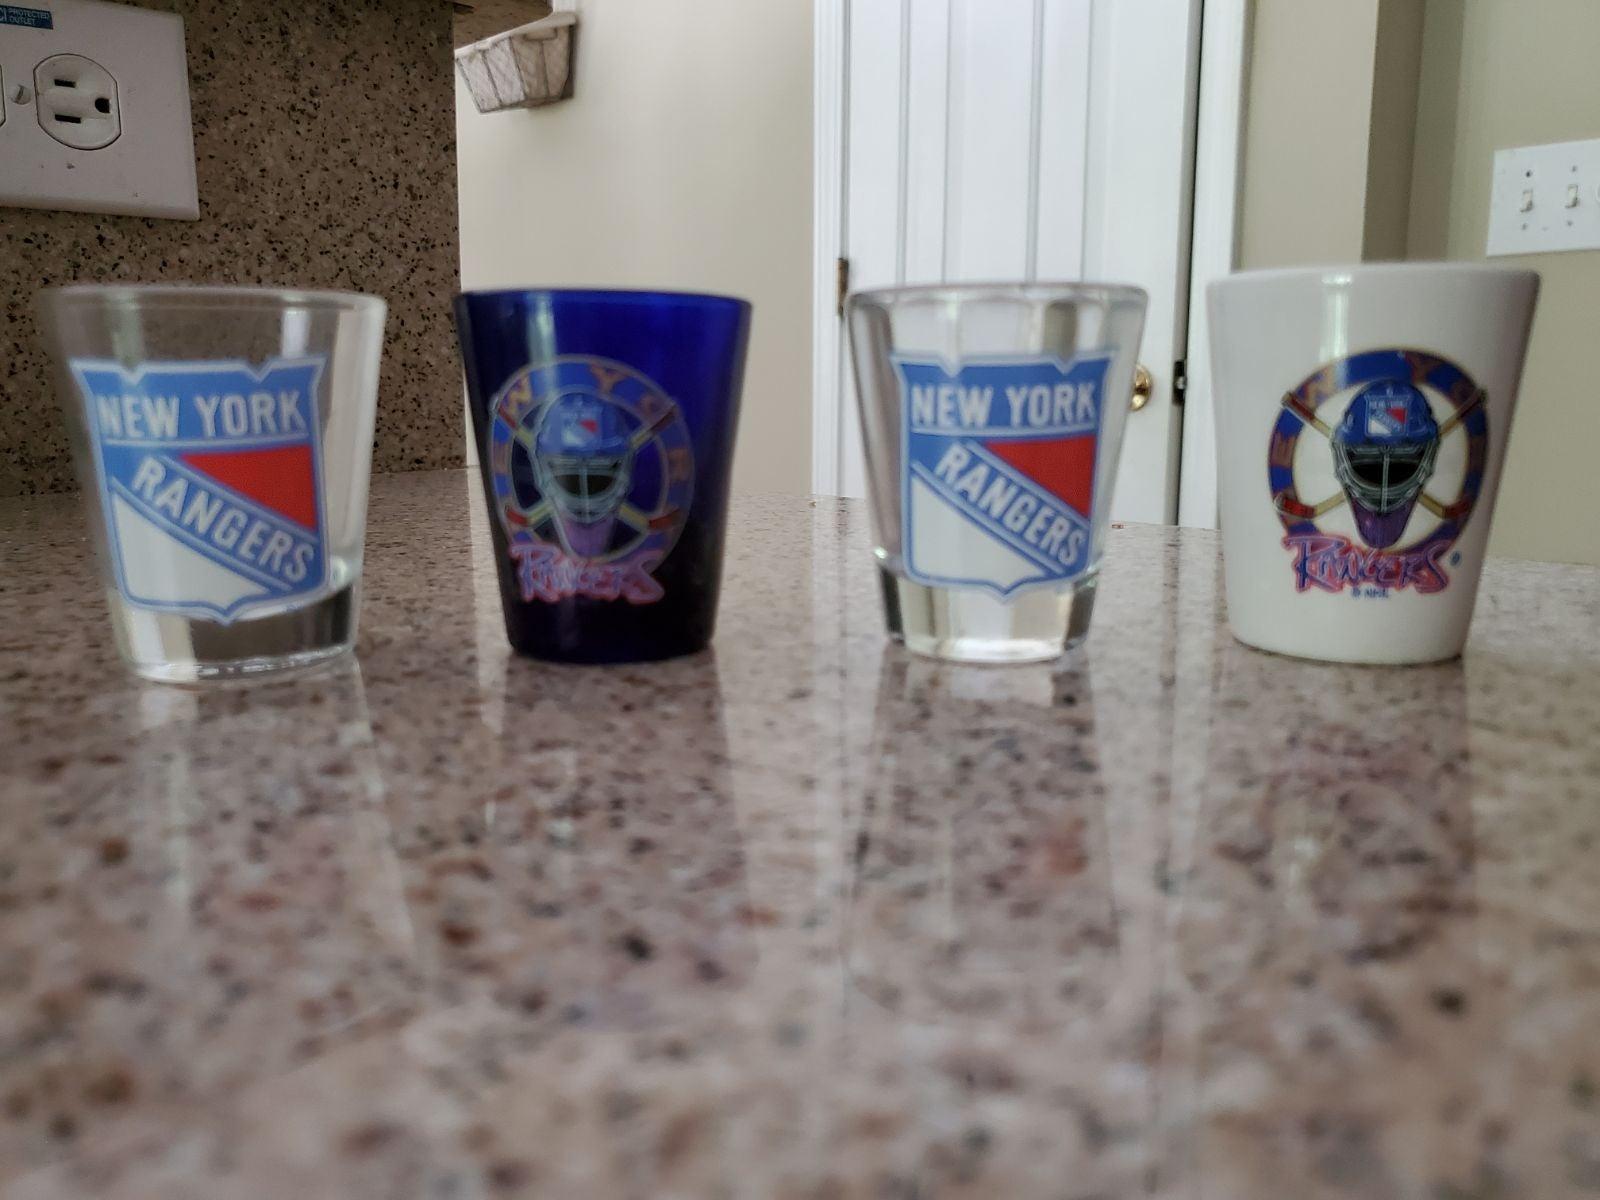 NY Rangers shot glasses